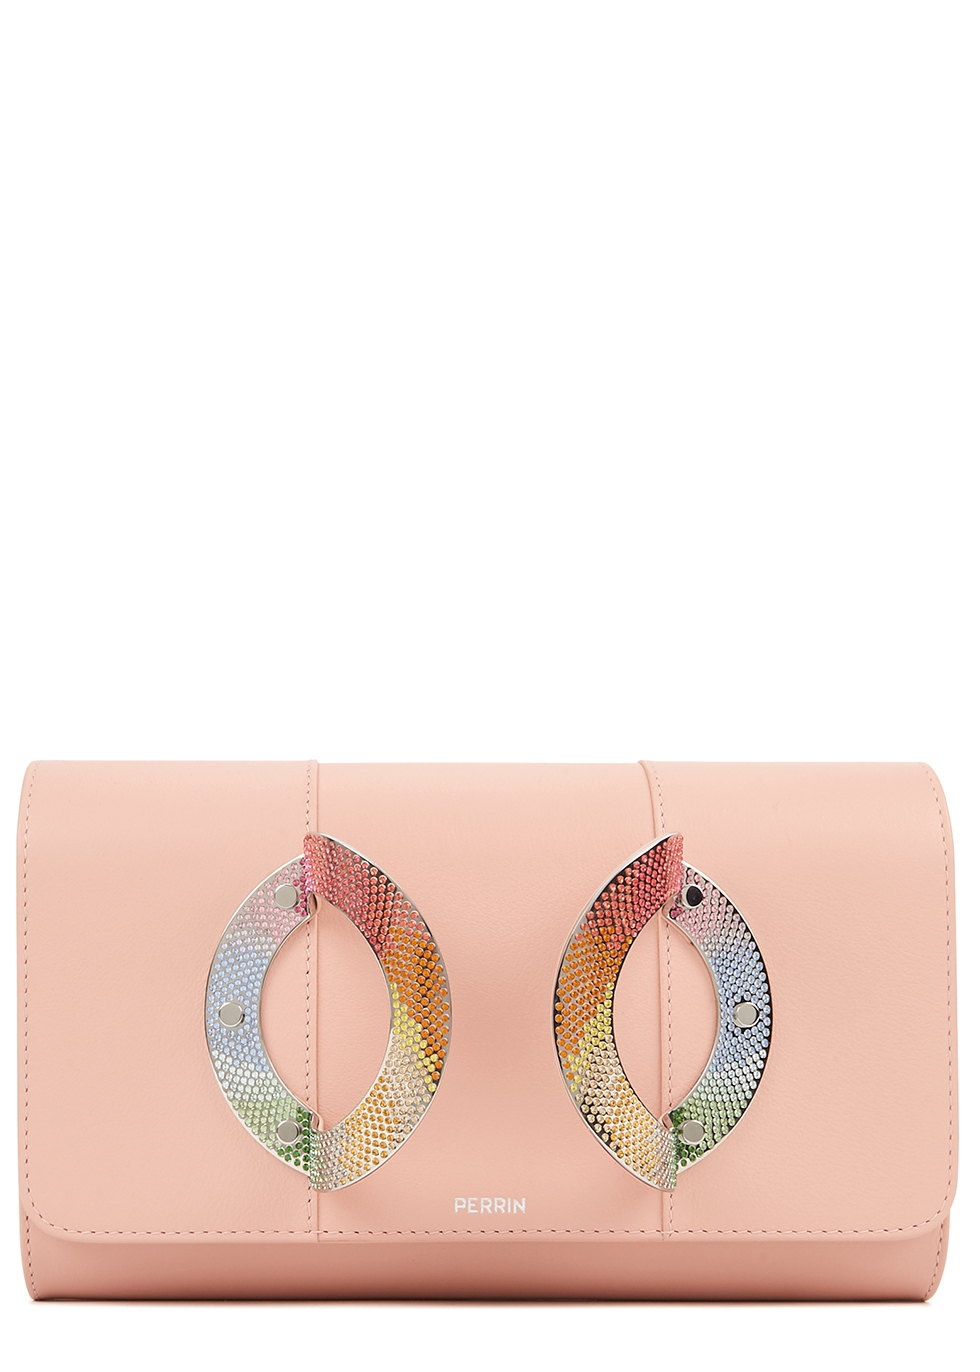 La Croisette light pink leather clutch